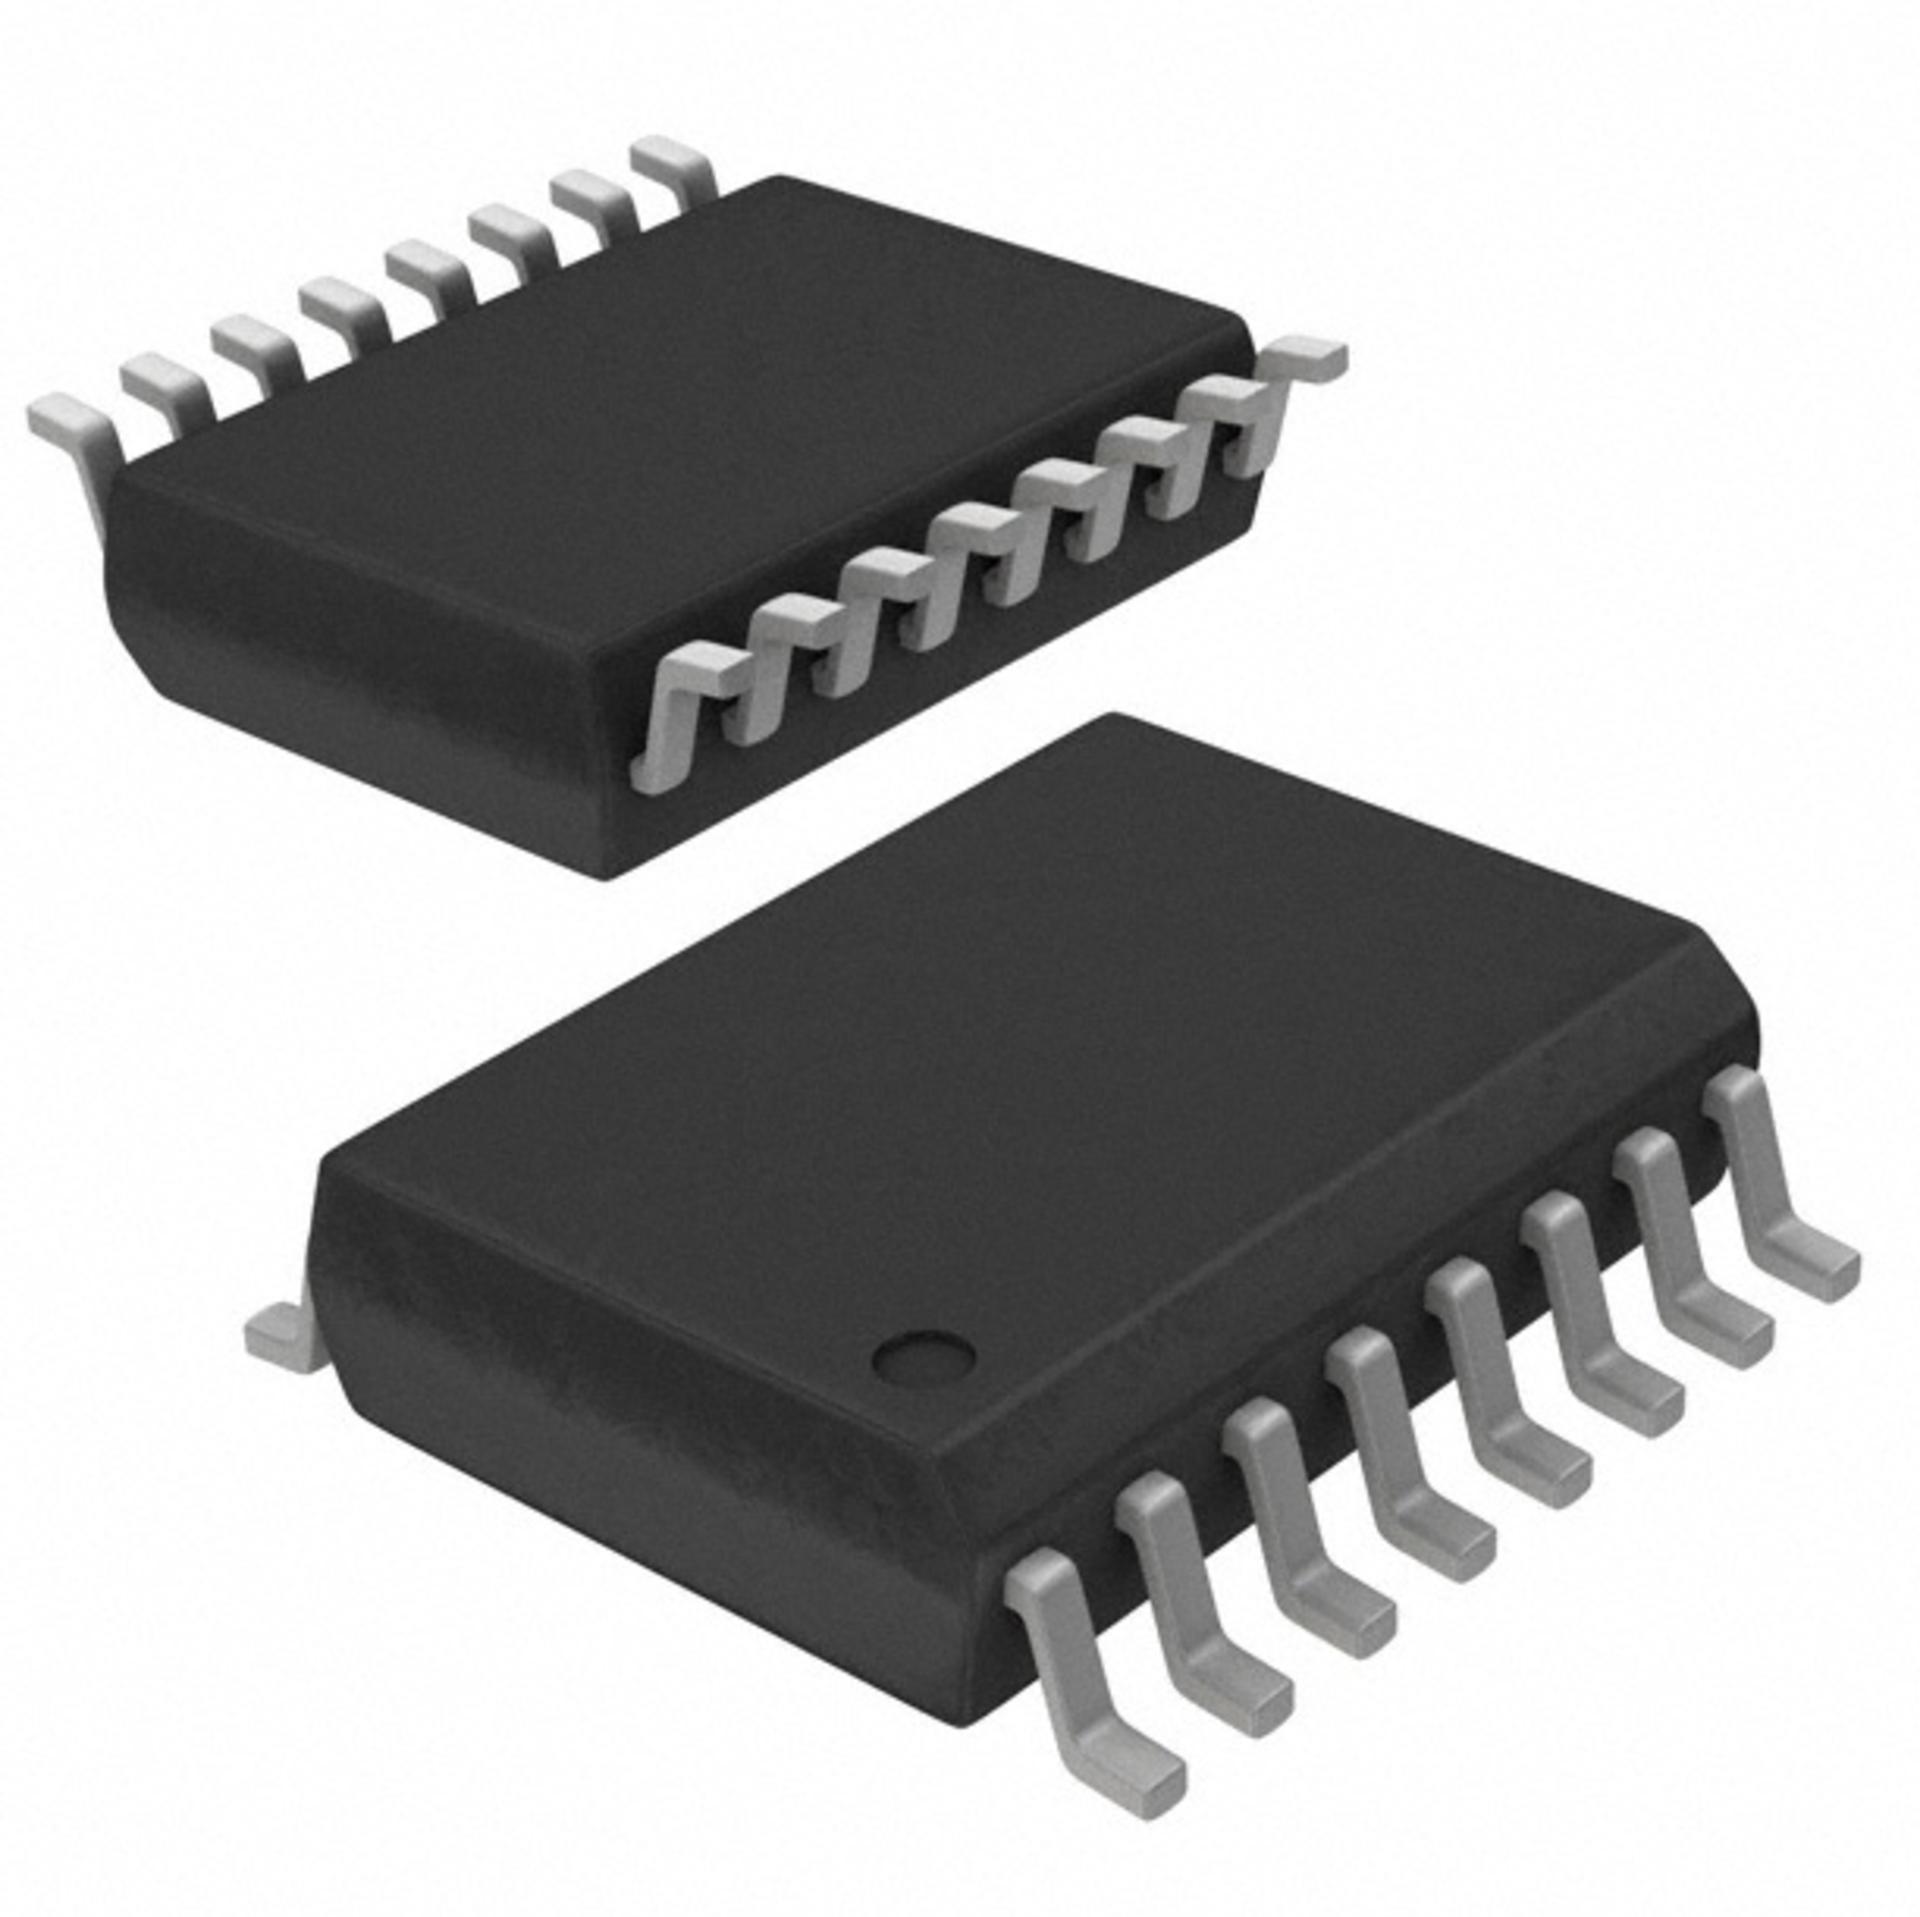 Micron Technology N25Q00AA11GSF40G, FLASH - NOR Memory IC 1Gb (256M x 4) SPI 108 MHz 16-SO, IC,